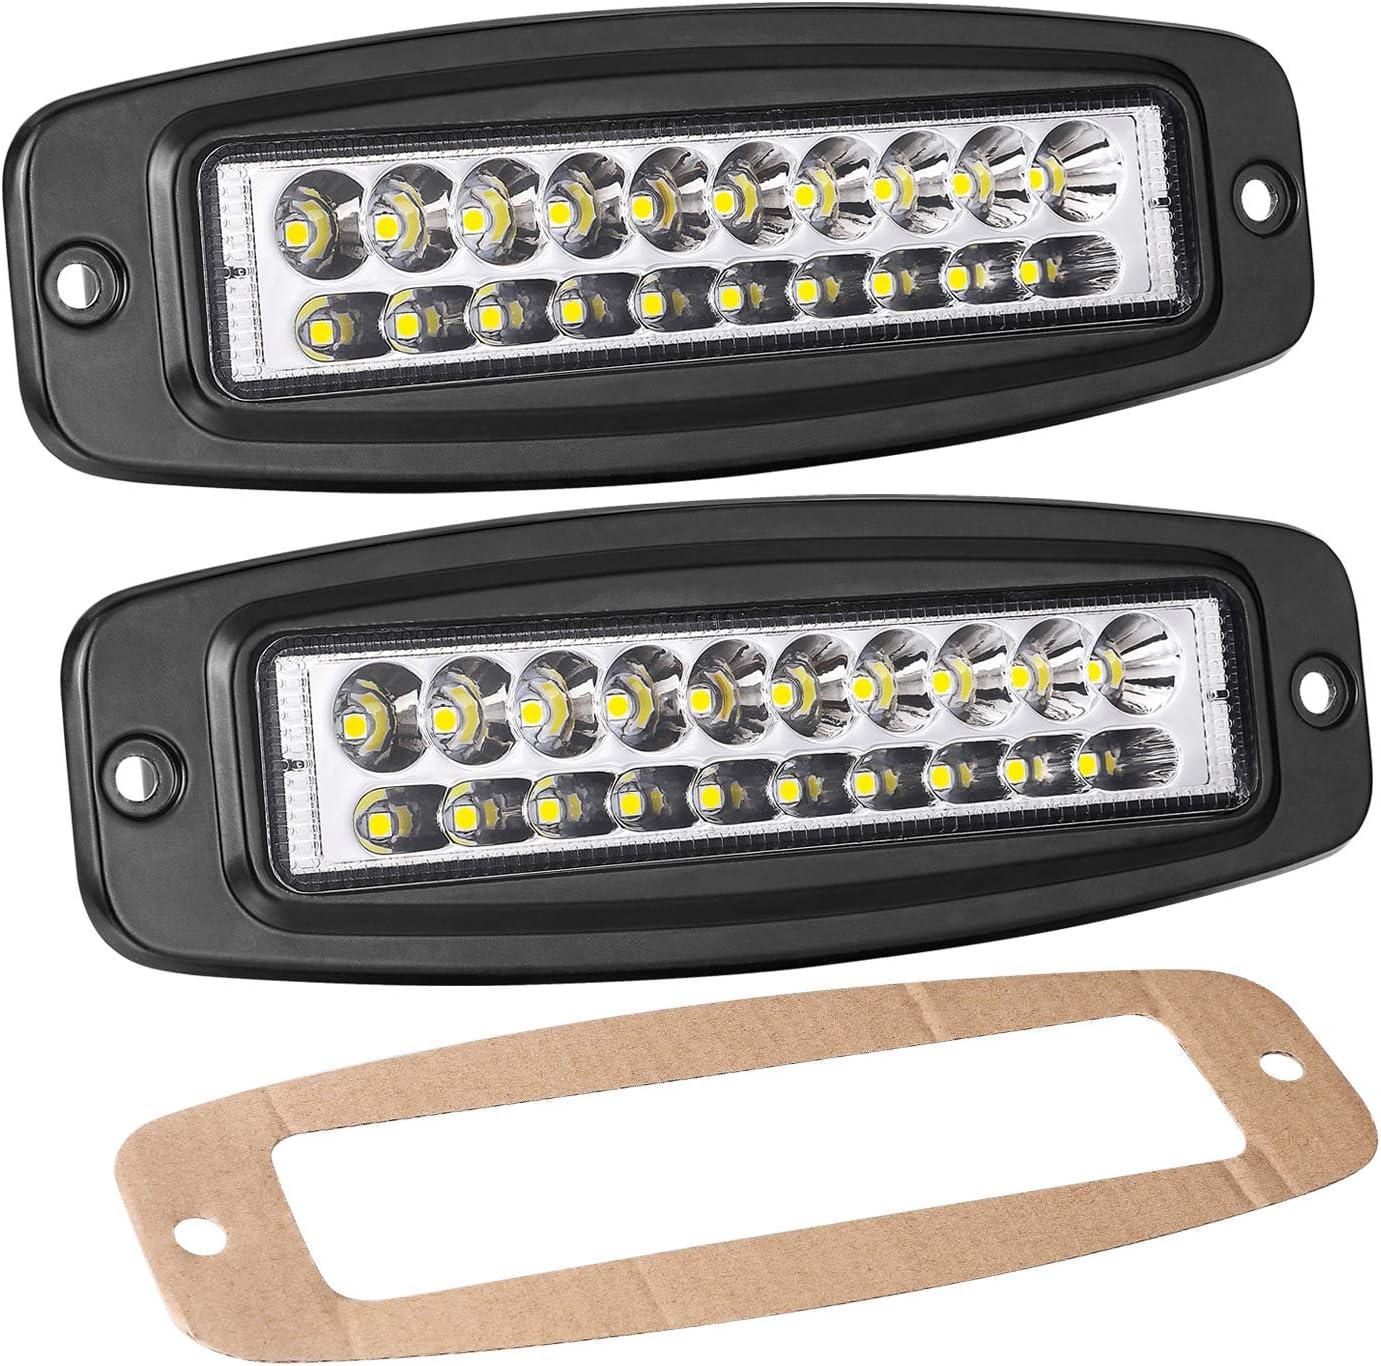 Yvoone-Auto 2pcs 5inch 84W Driving Lights LED Work Light Flush LED Light Bar Bumper Fog Lights Off Road Lights for Truck SUV Boat 4x4 Grill Mount Flush Mount Work Lights